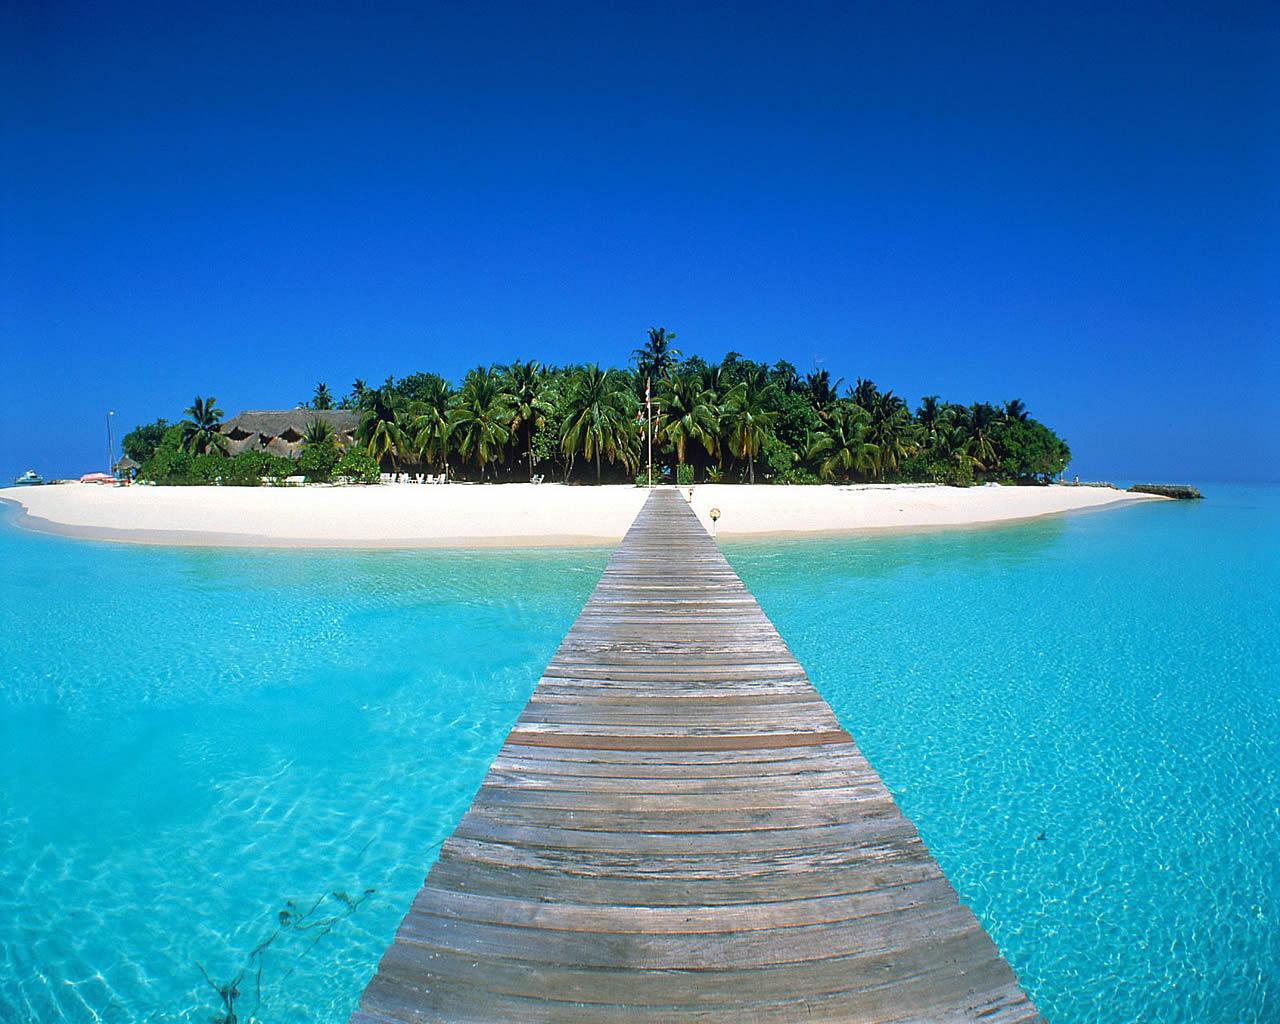 Tropical Island Wallpaper 10610 Hd Wallpapers in Beach   Imagesci 1280x1024